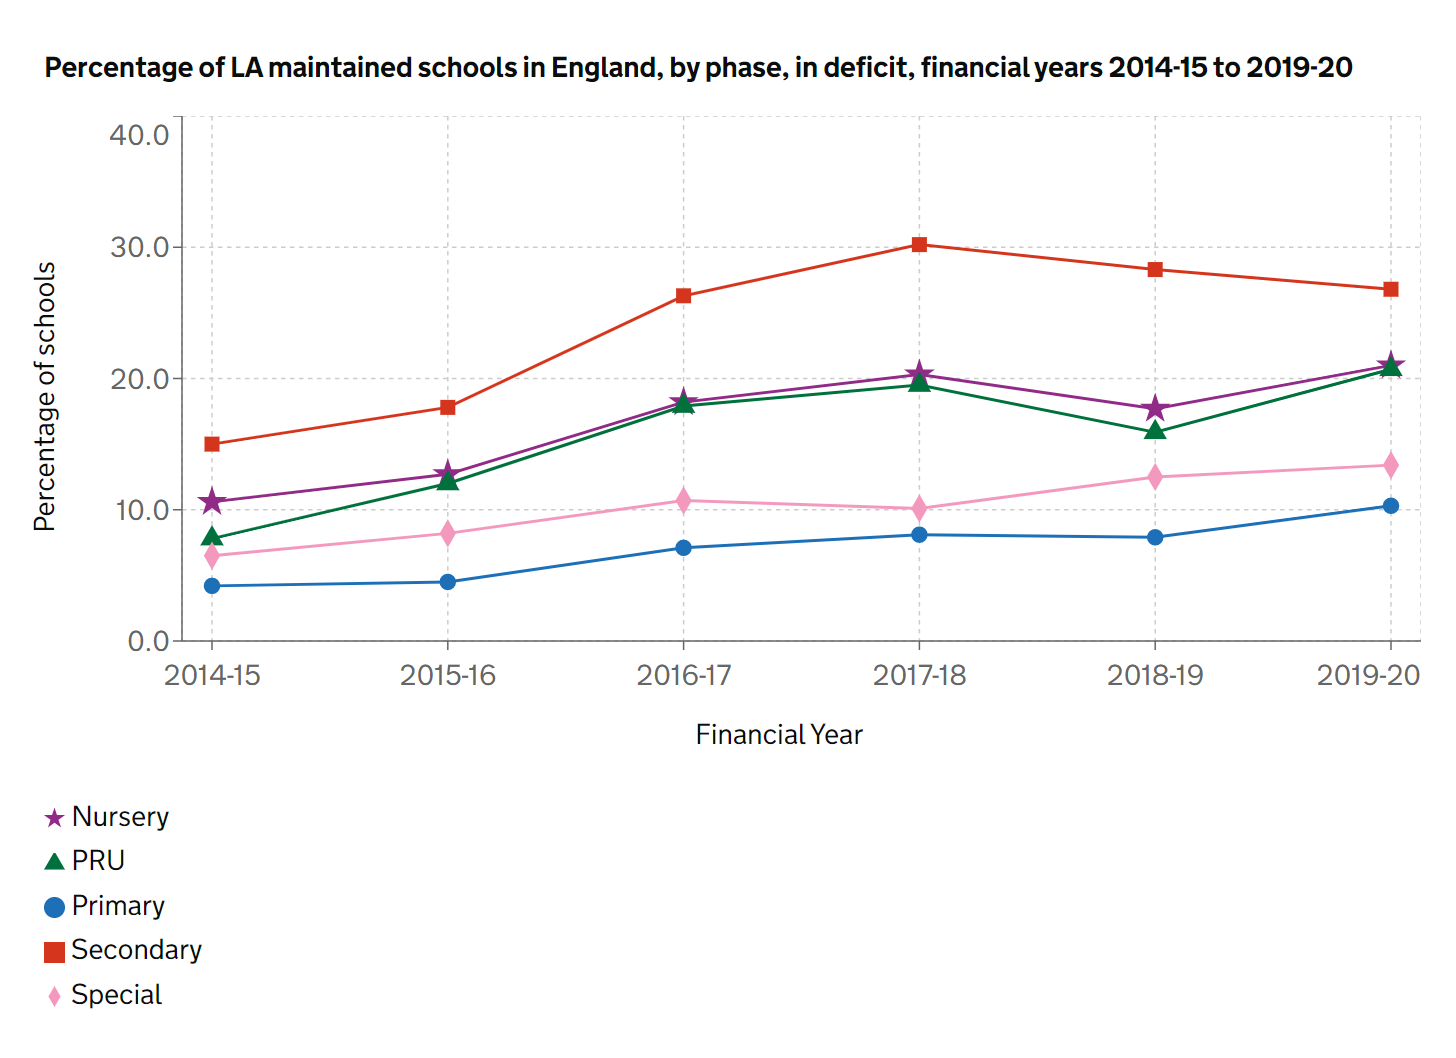 schools in deficit